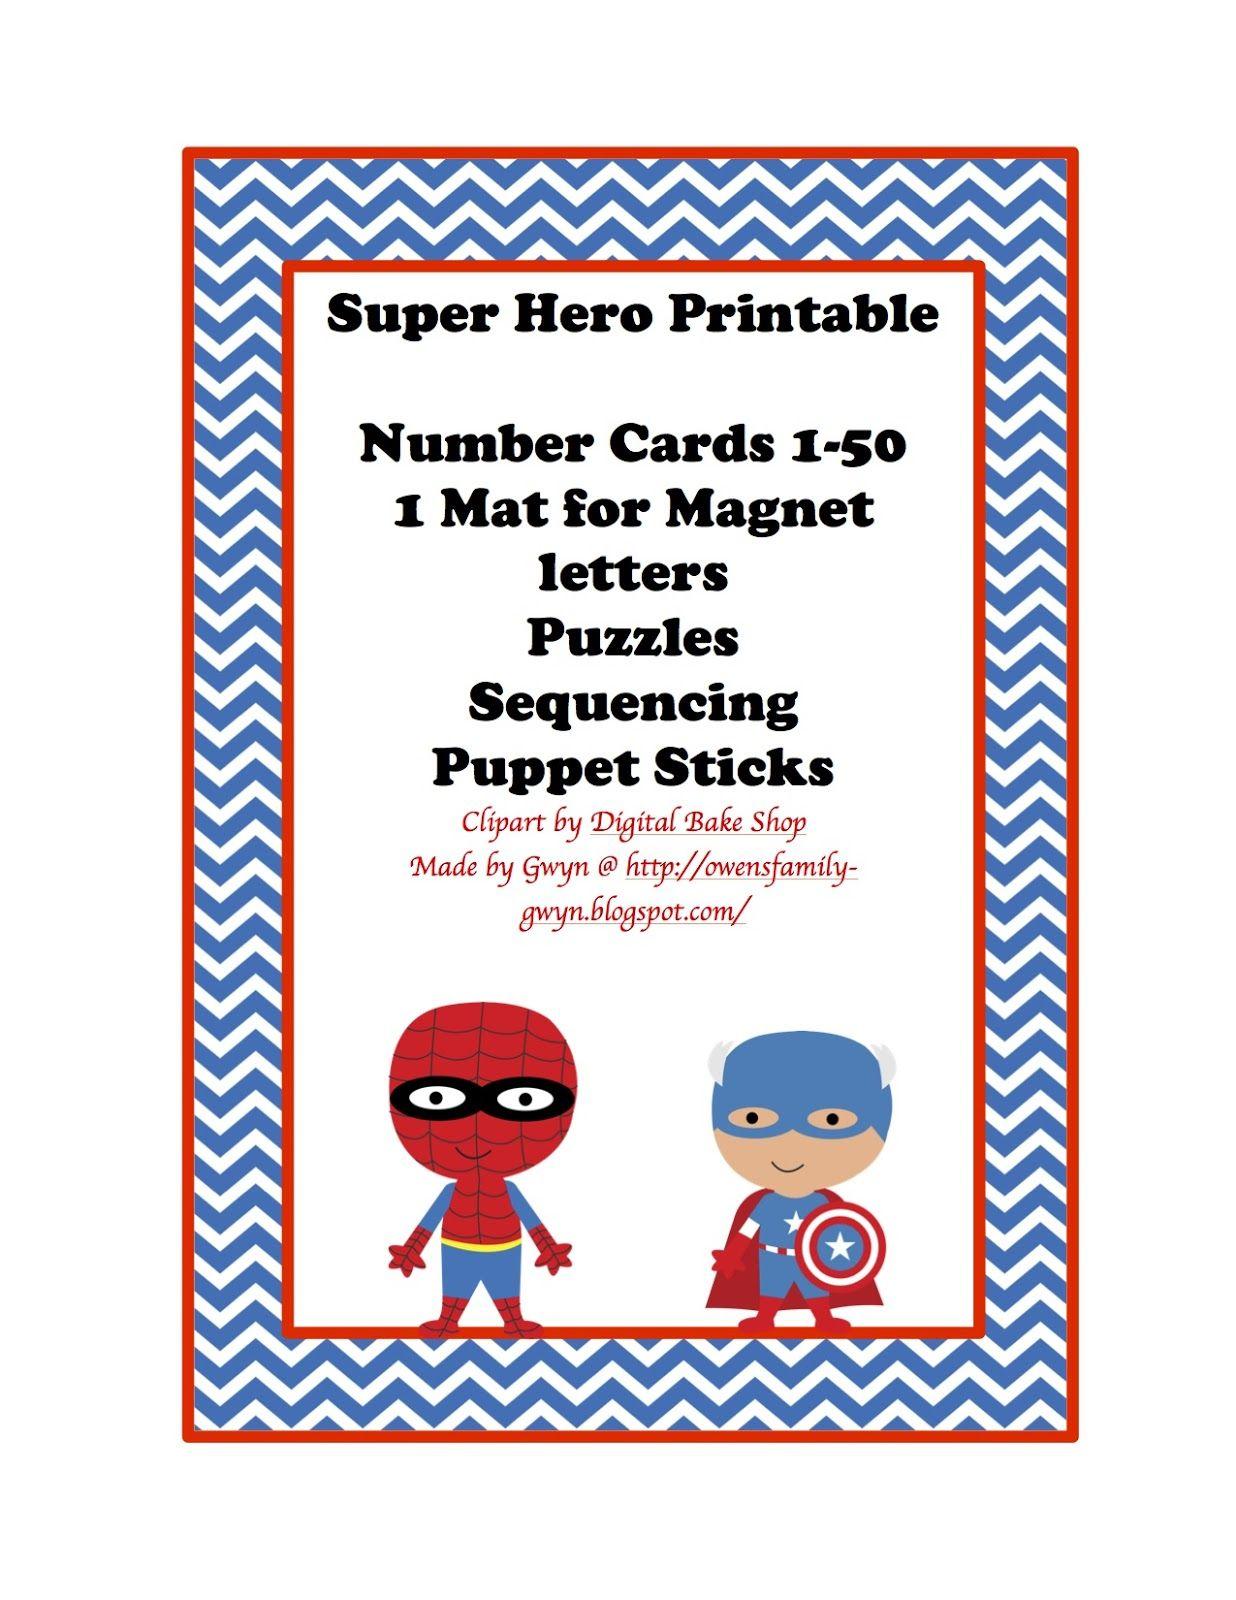 Super Hero Printable 2